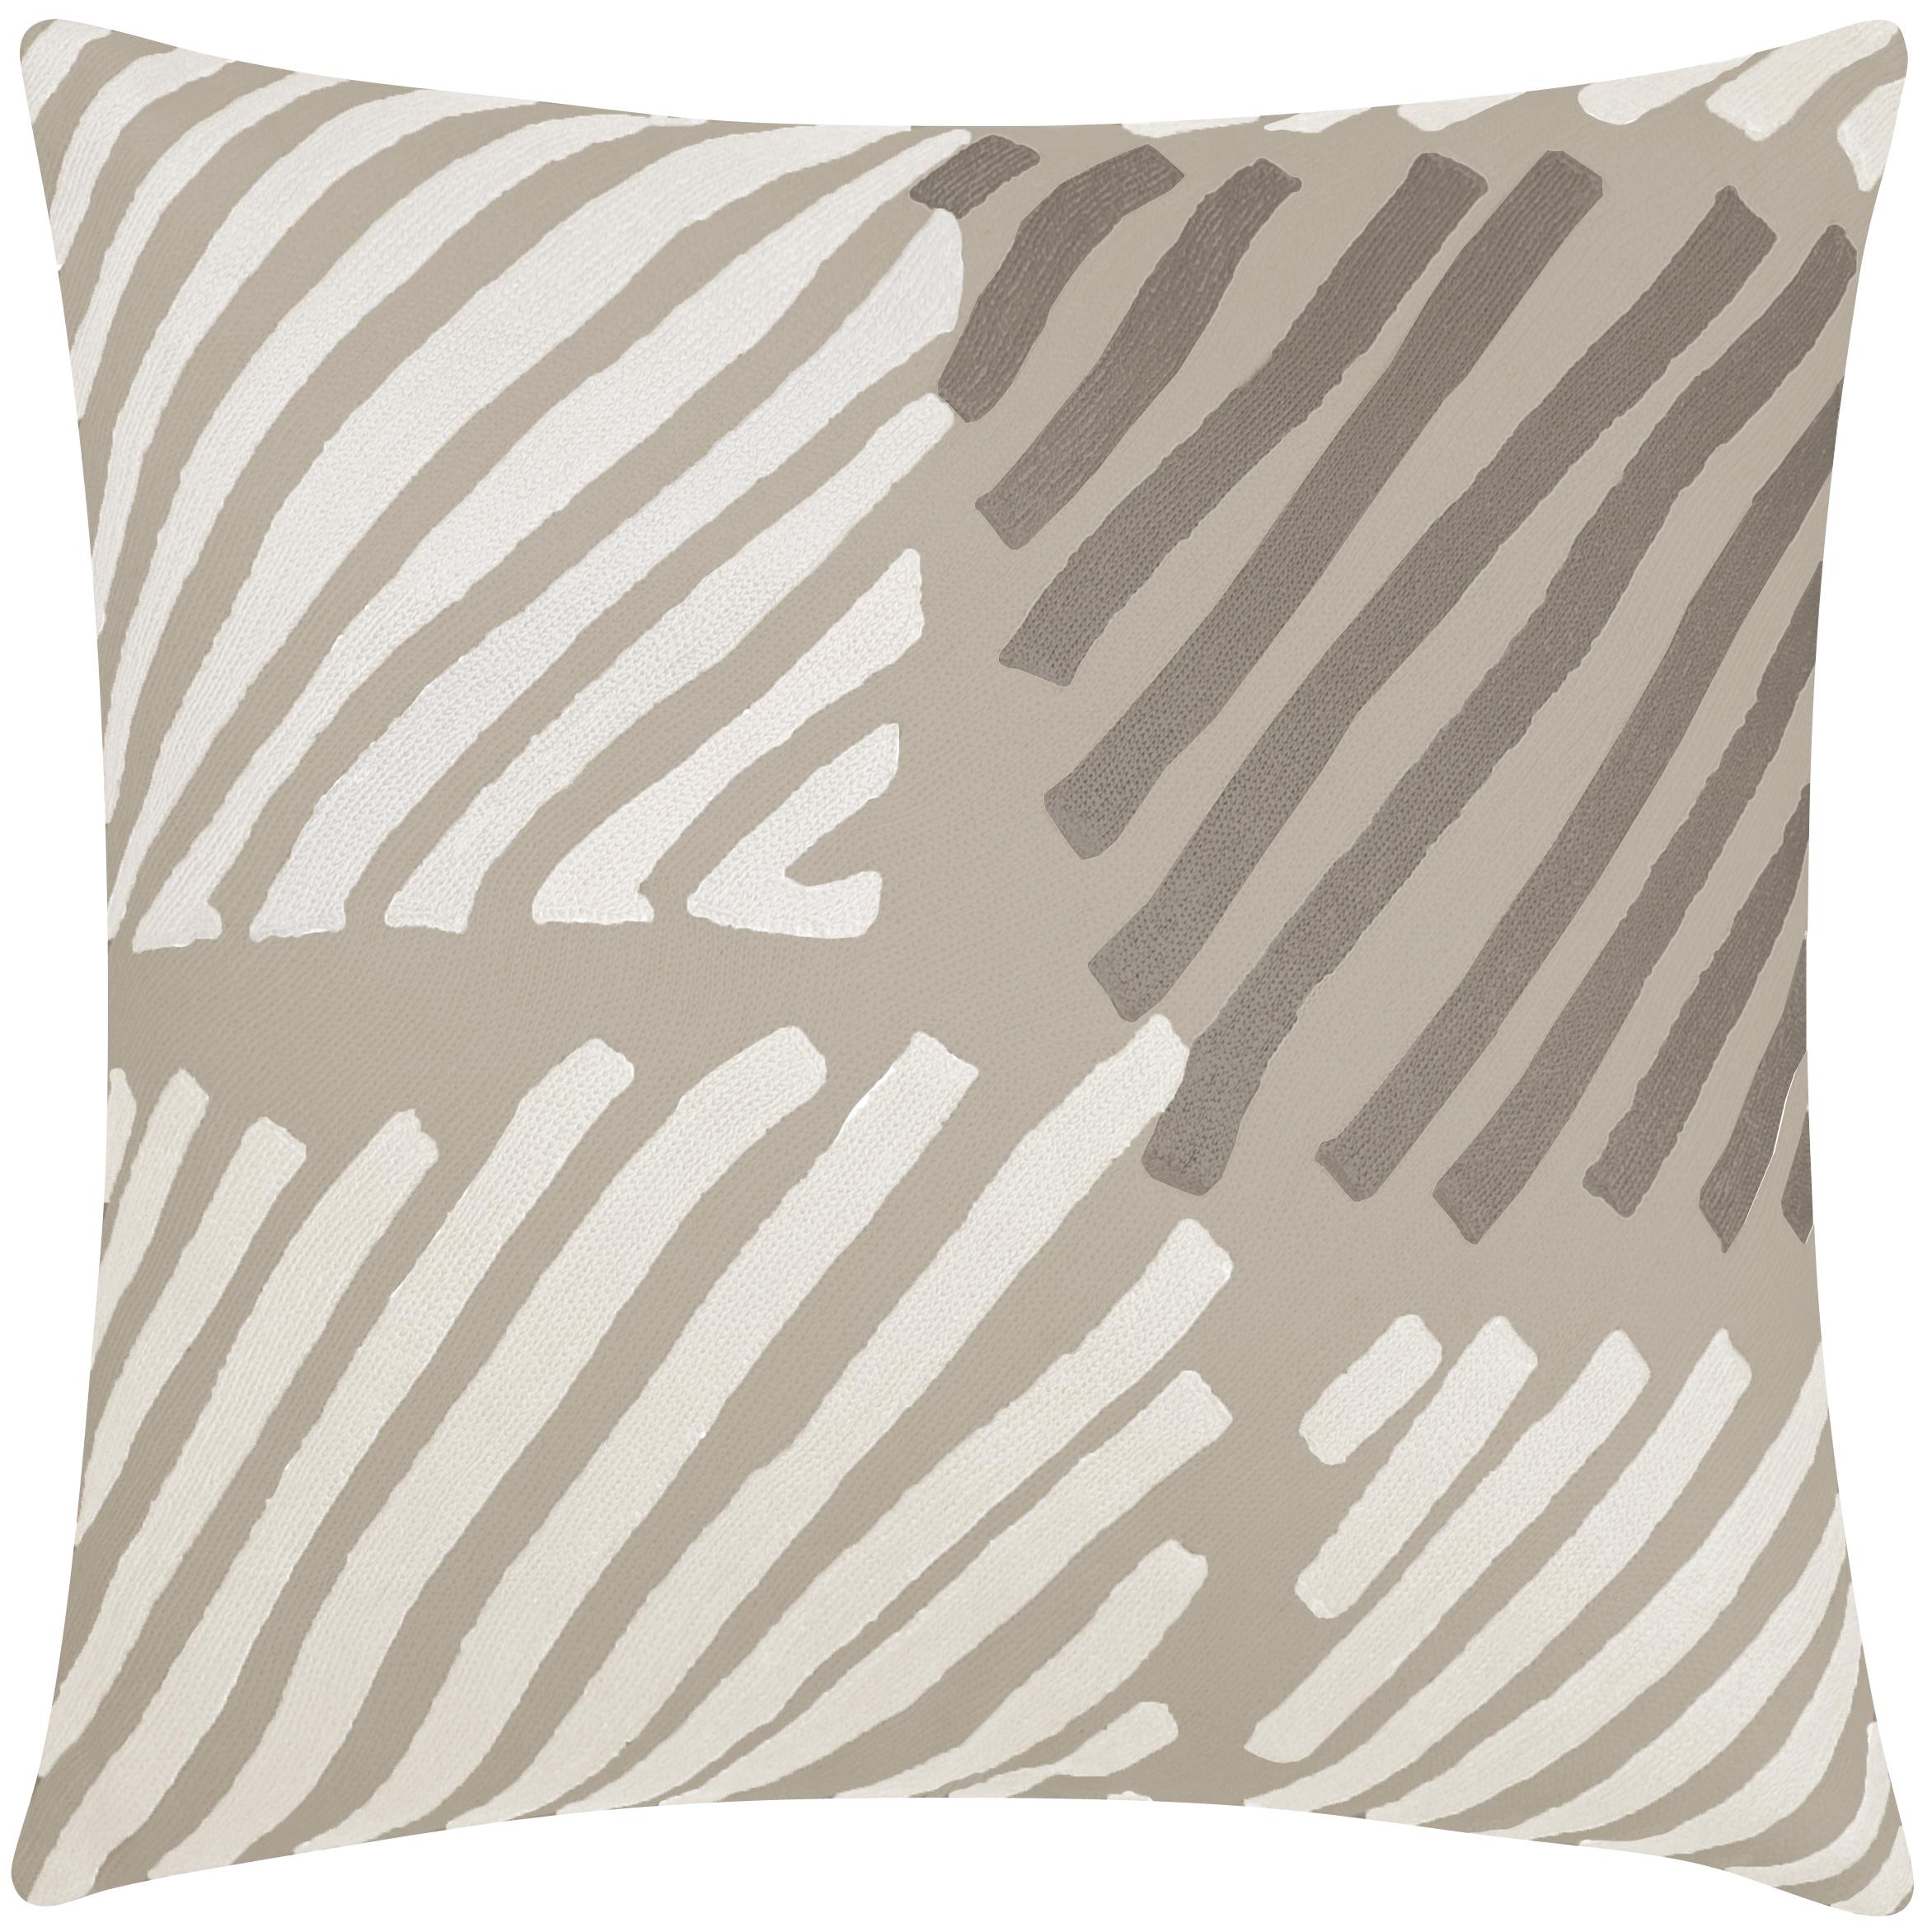 bag big dining pillows dp zebra bean original pillow com chair amazon joe kitchen